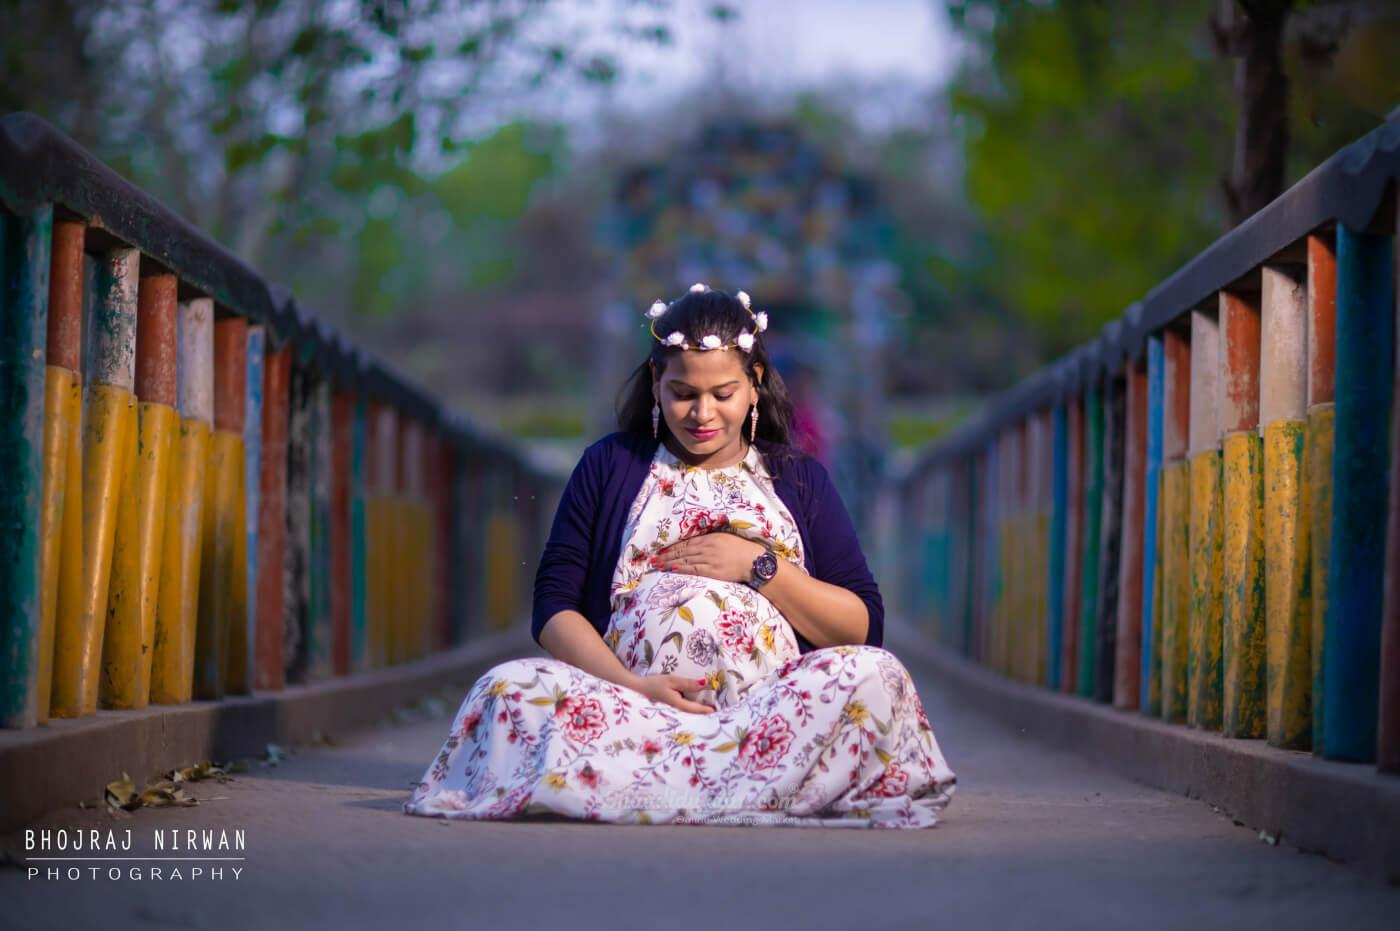 Bhojraj Nirwan Photography